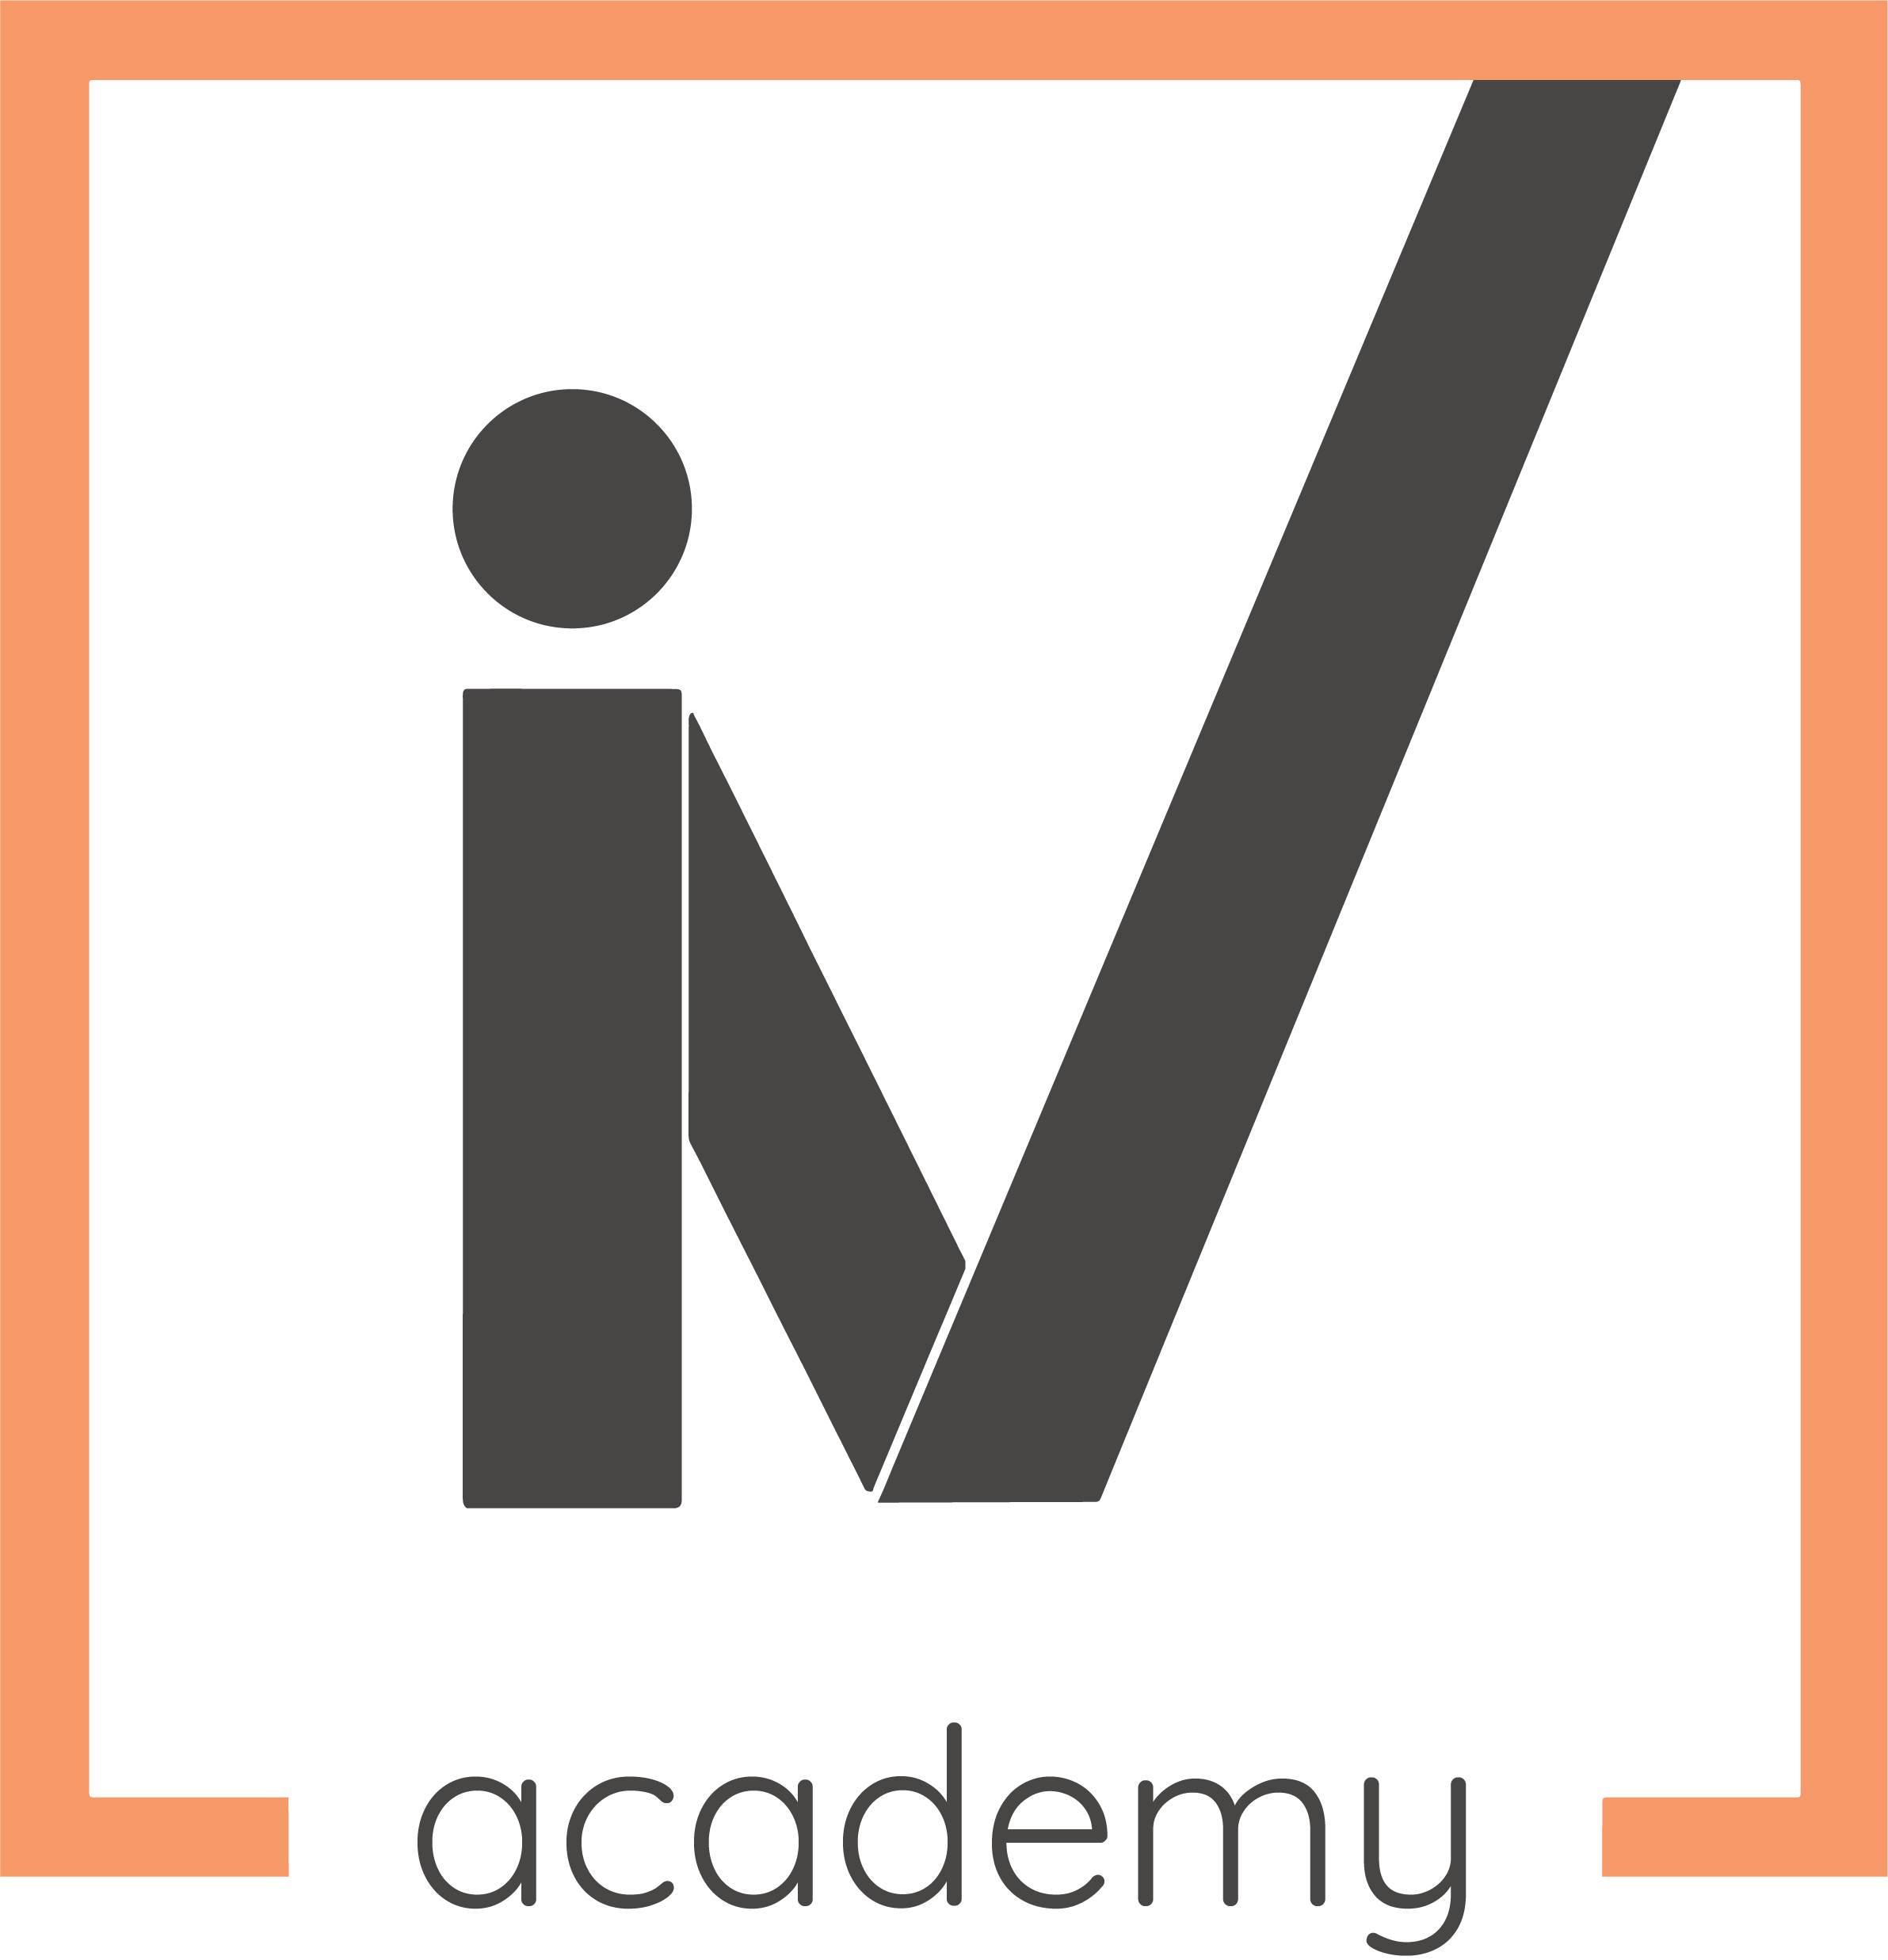 IV academy-oranjegrijs